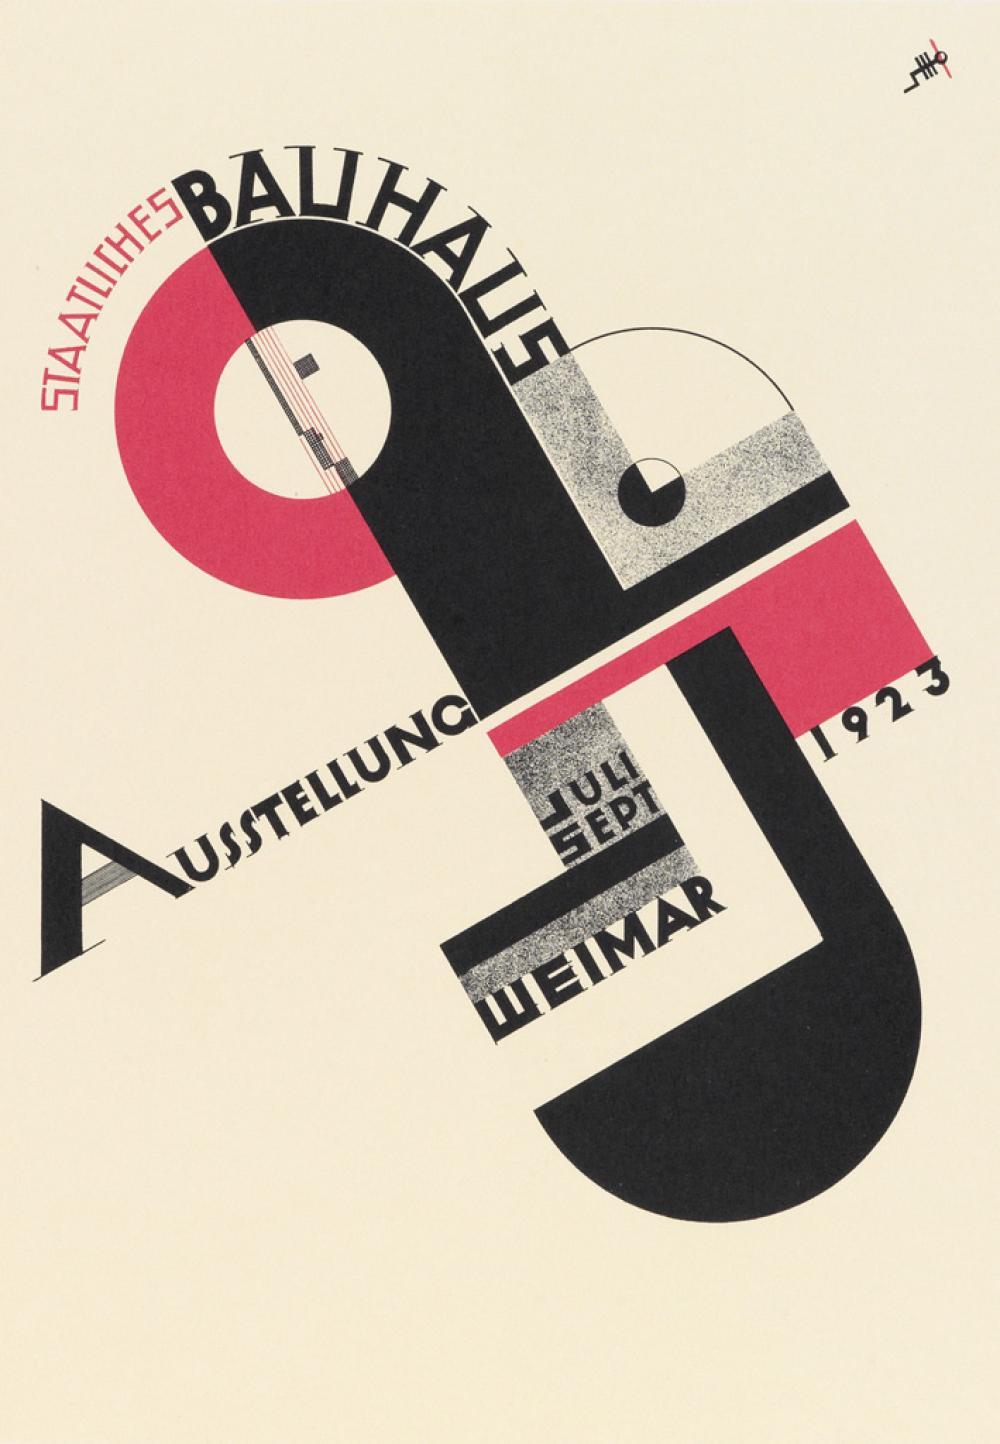 (DESIGN.) Cohen, Arthur; editor. The Avant-Garde in Print.